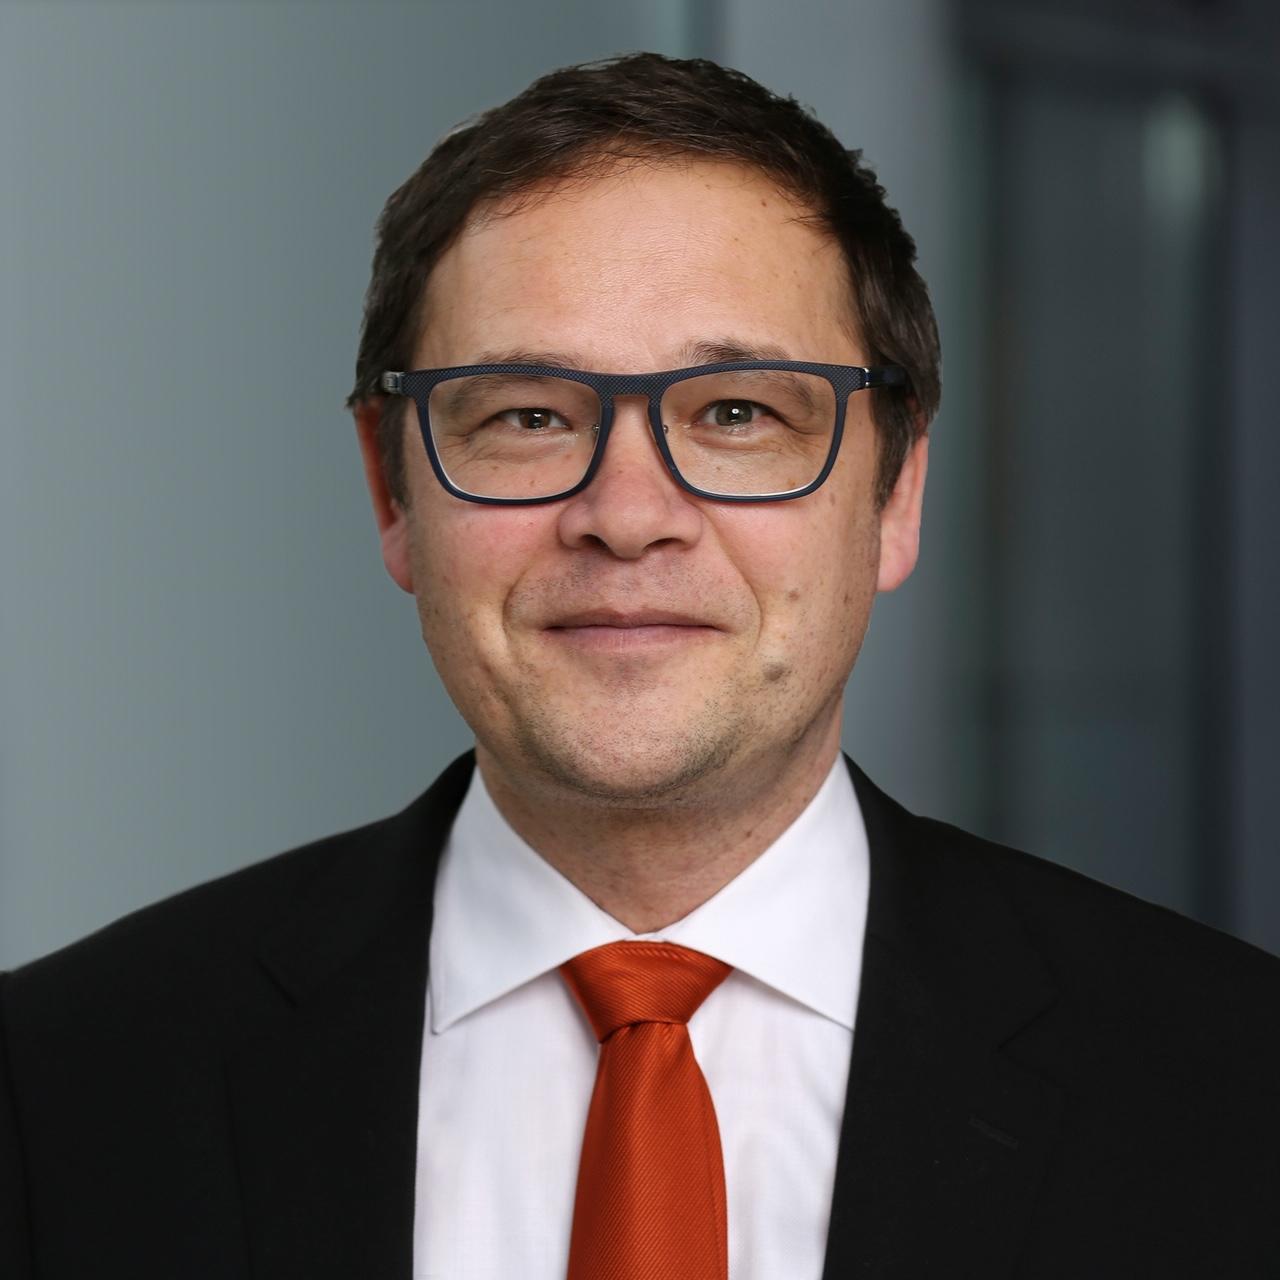 Carsten Niepelt